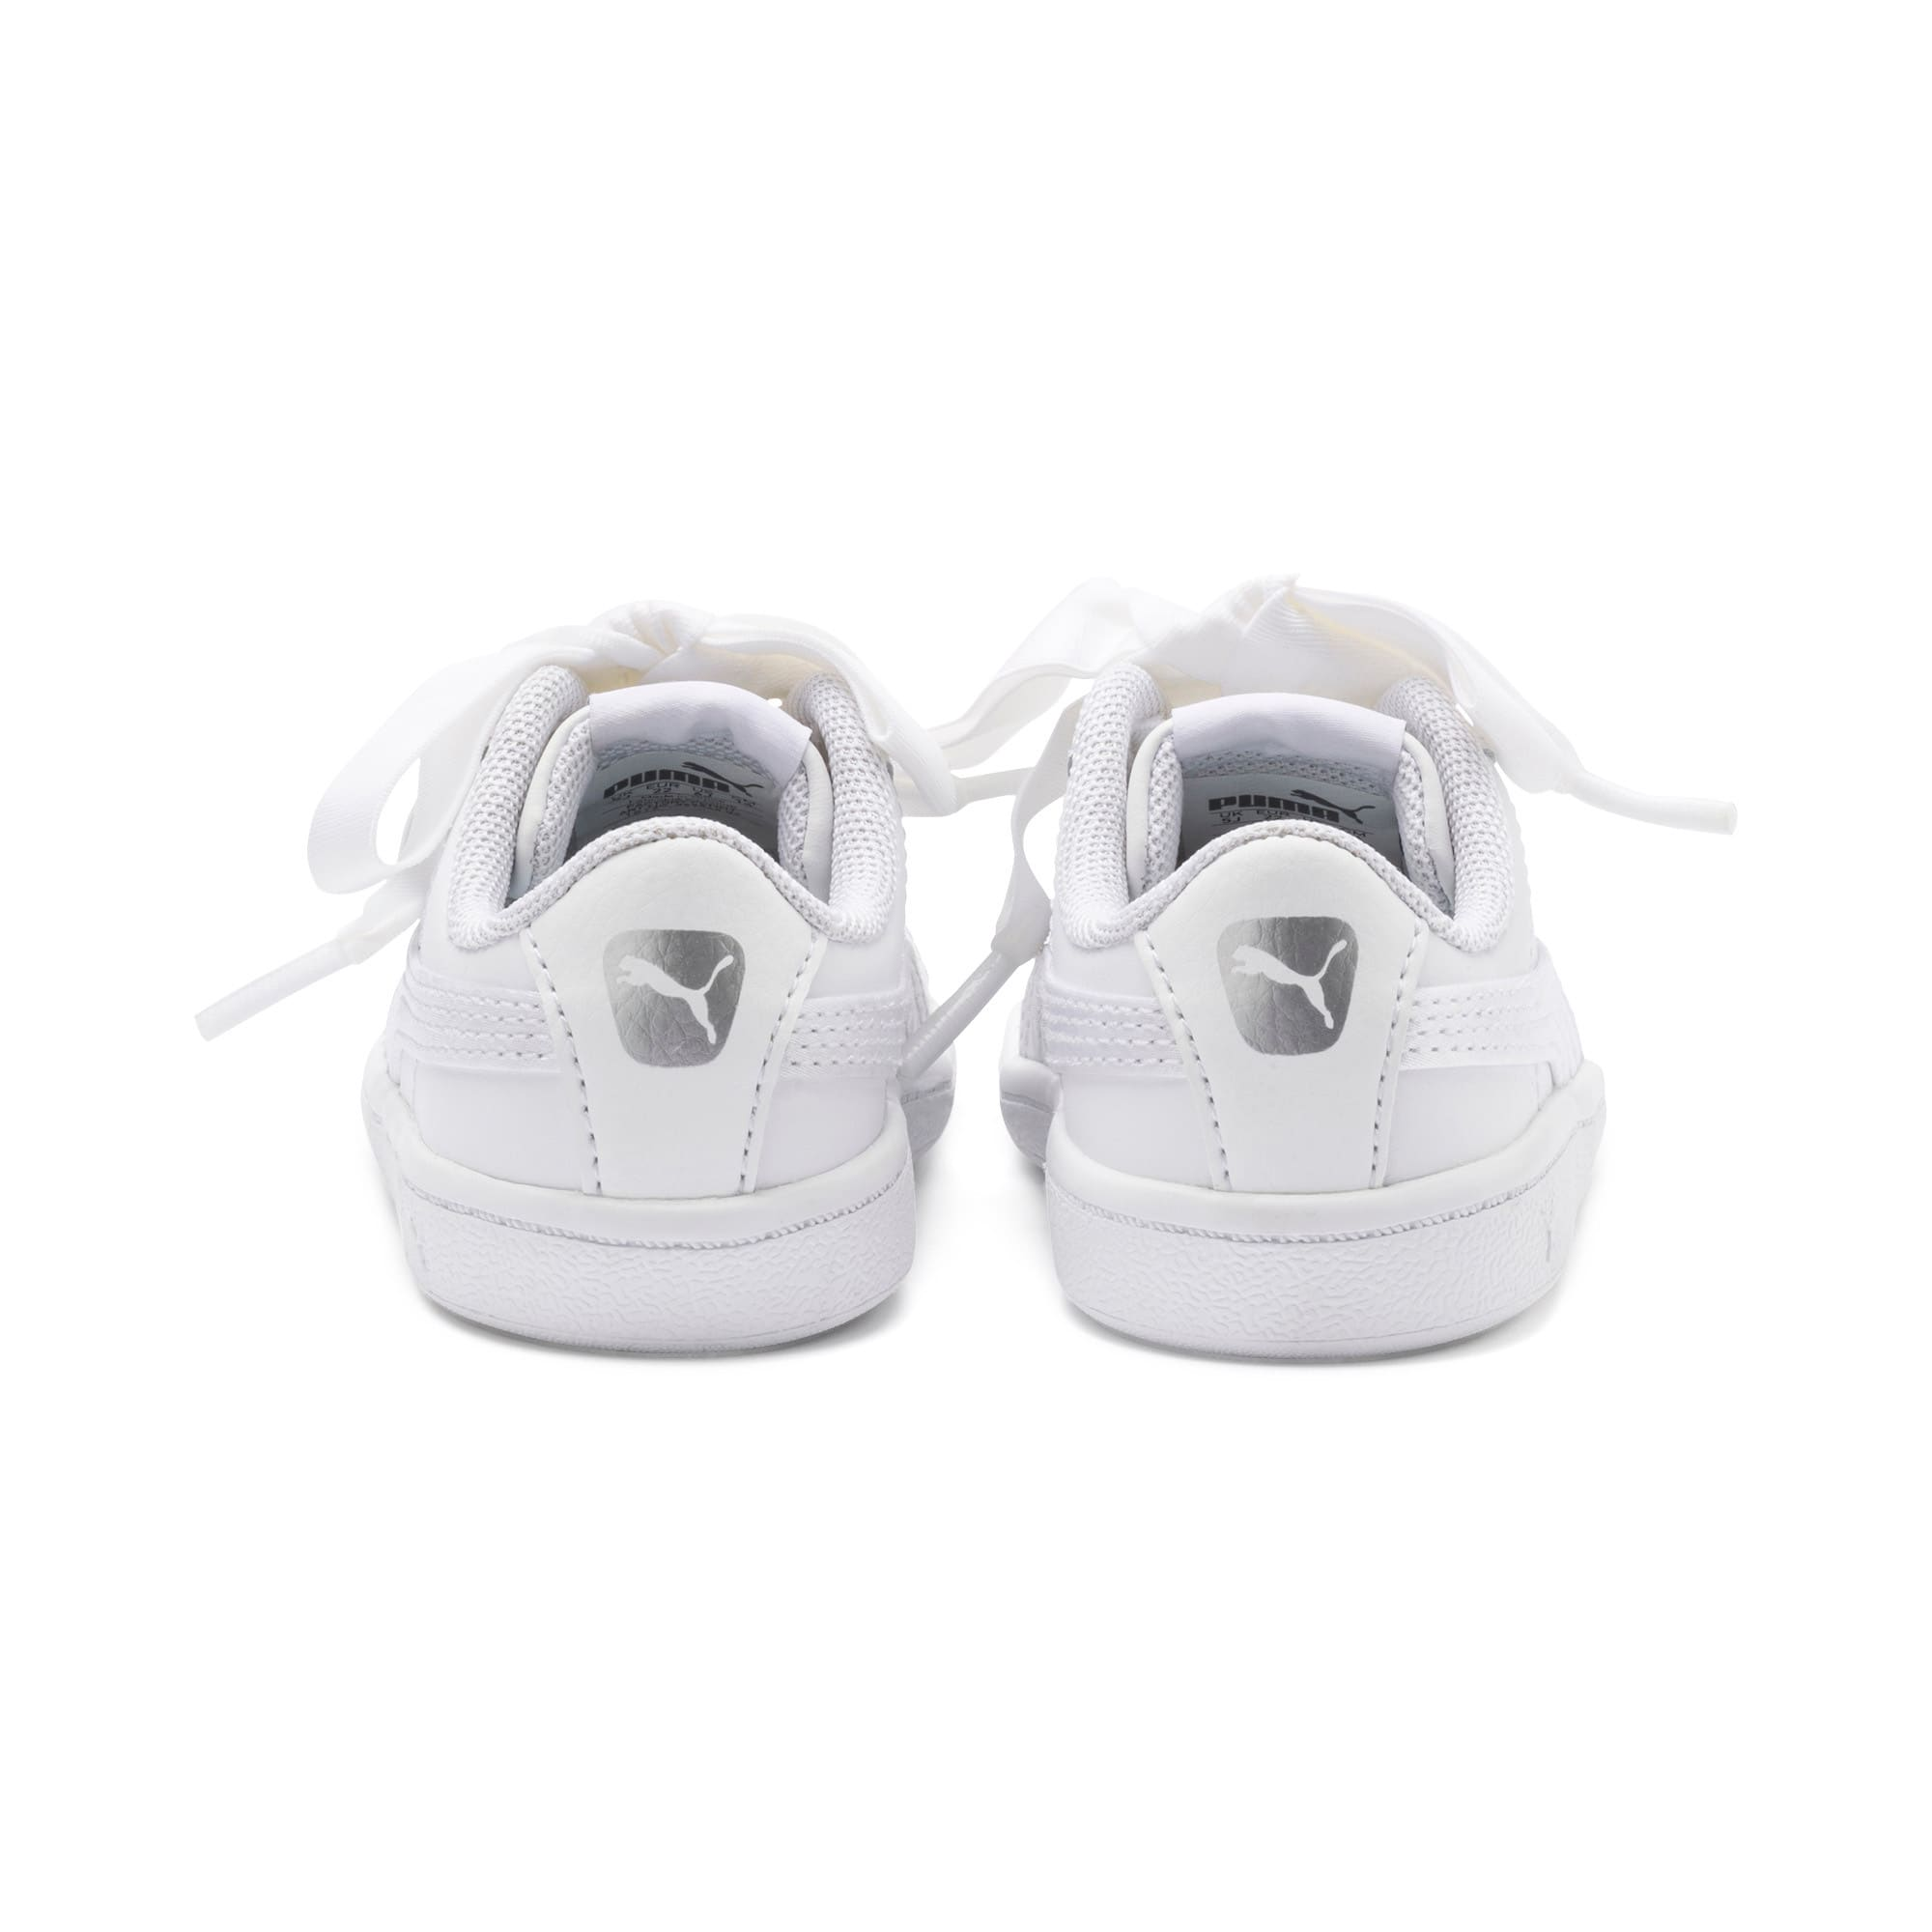 Miniatura 3 de ZapatosPUMA Vikky Ribbon Satin AC para niños, Puma White-Puma White, mediano